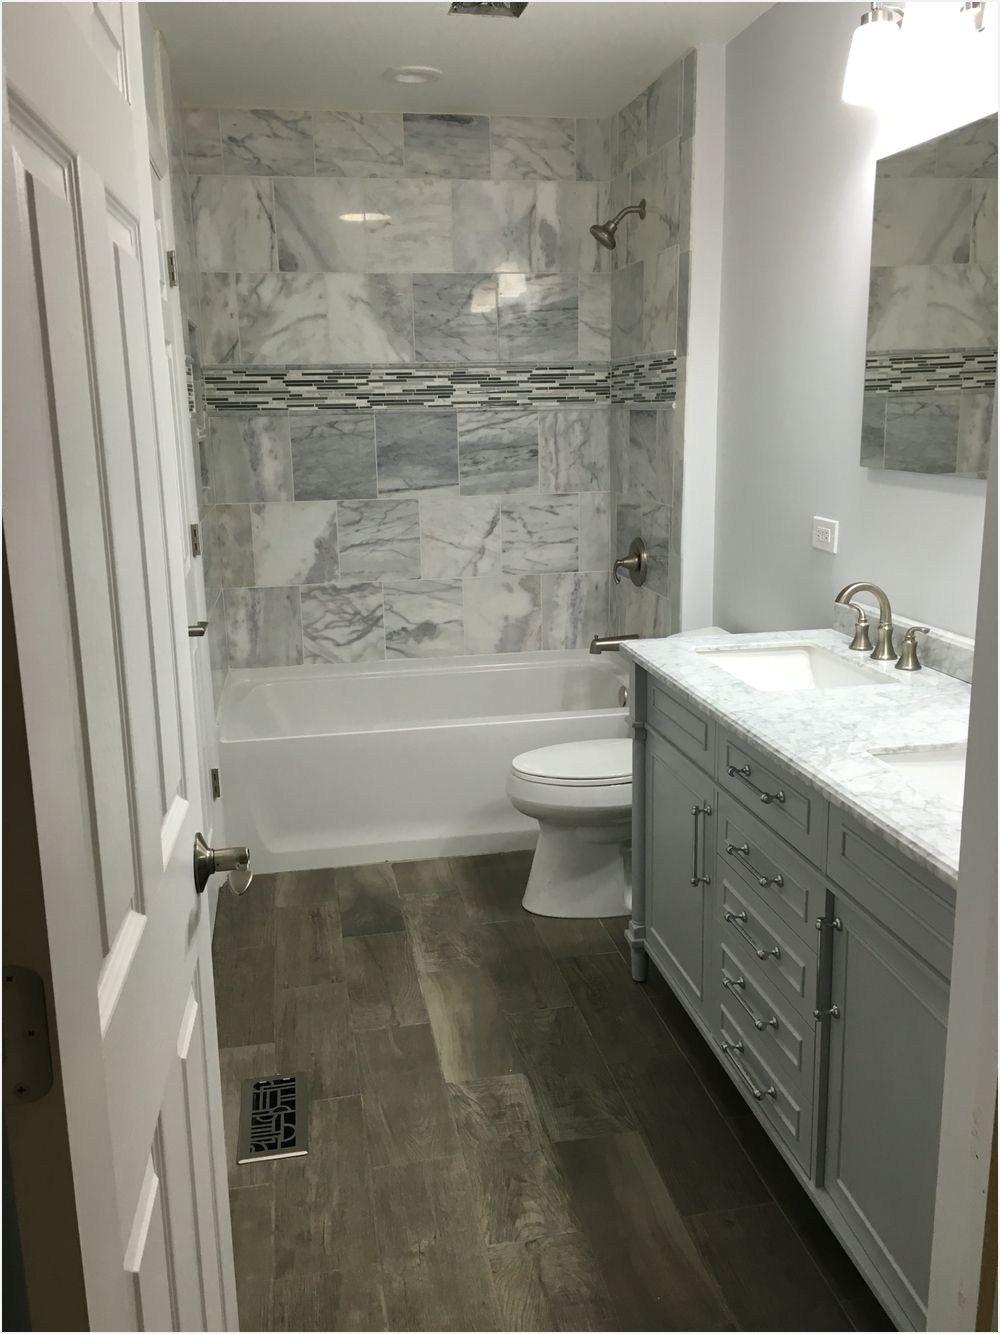 41 awesome small full bathroom remodel ideas small full on bathroom renovation ideas id=67328